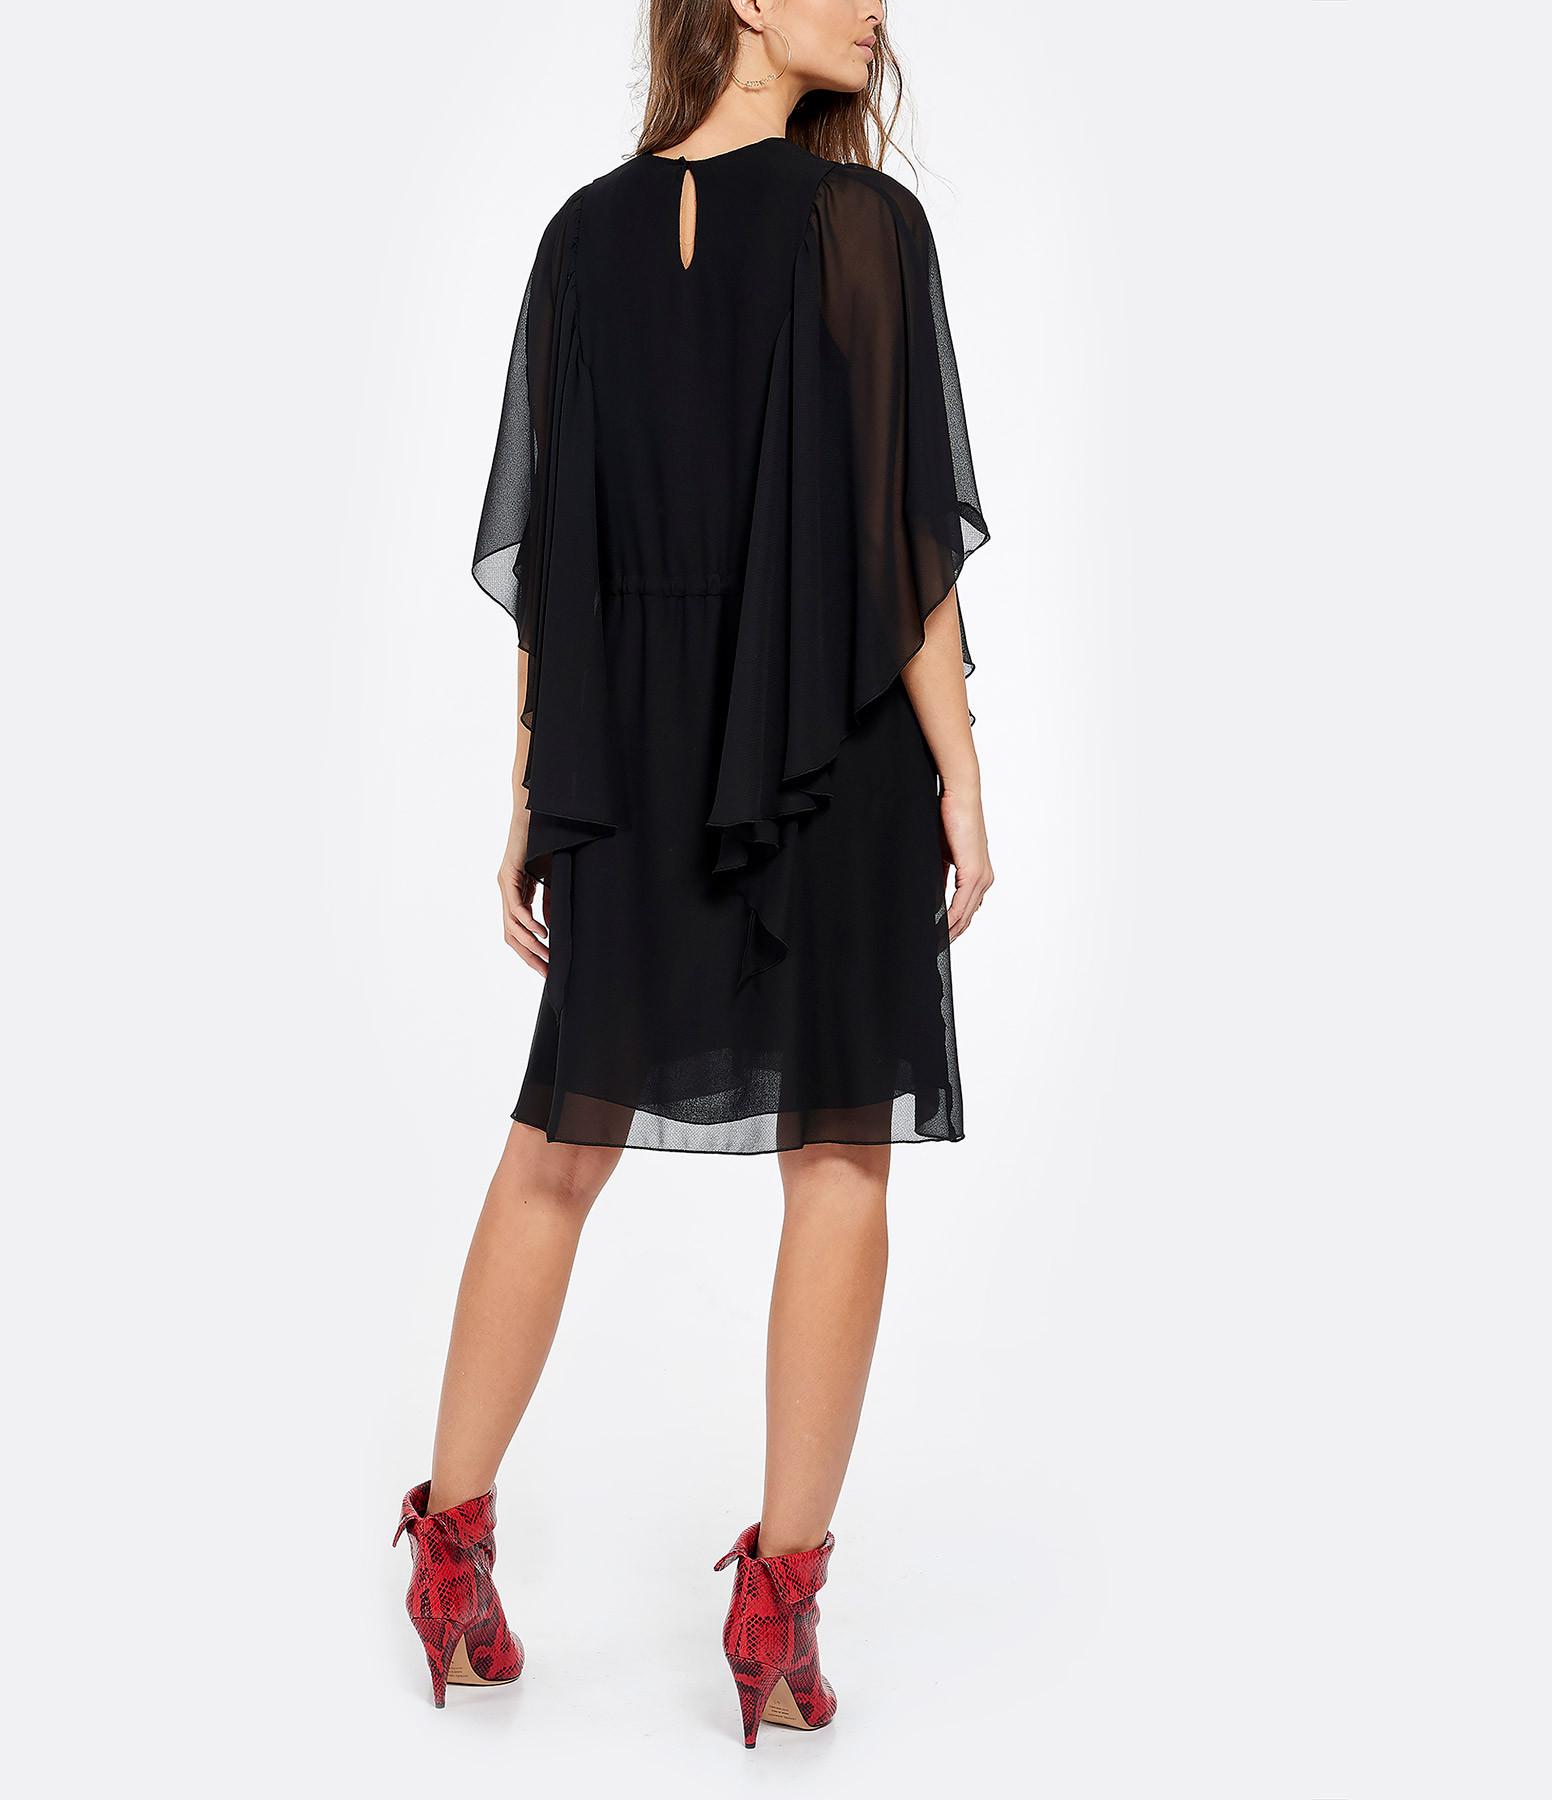 SEE BY CHLOE - Robe Volants Noir